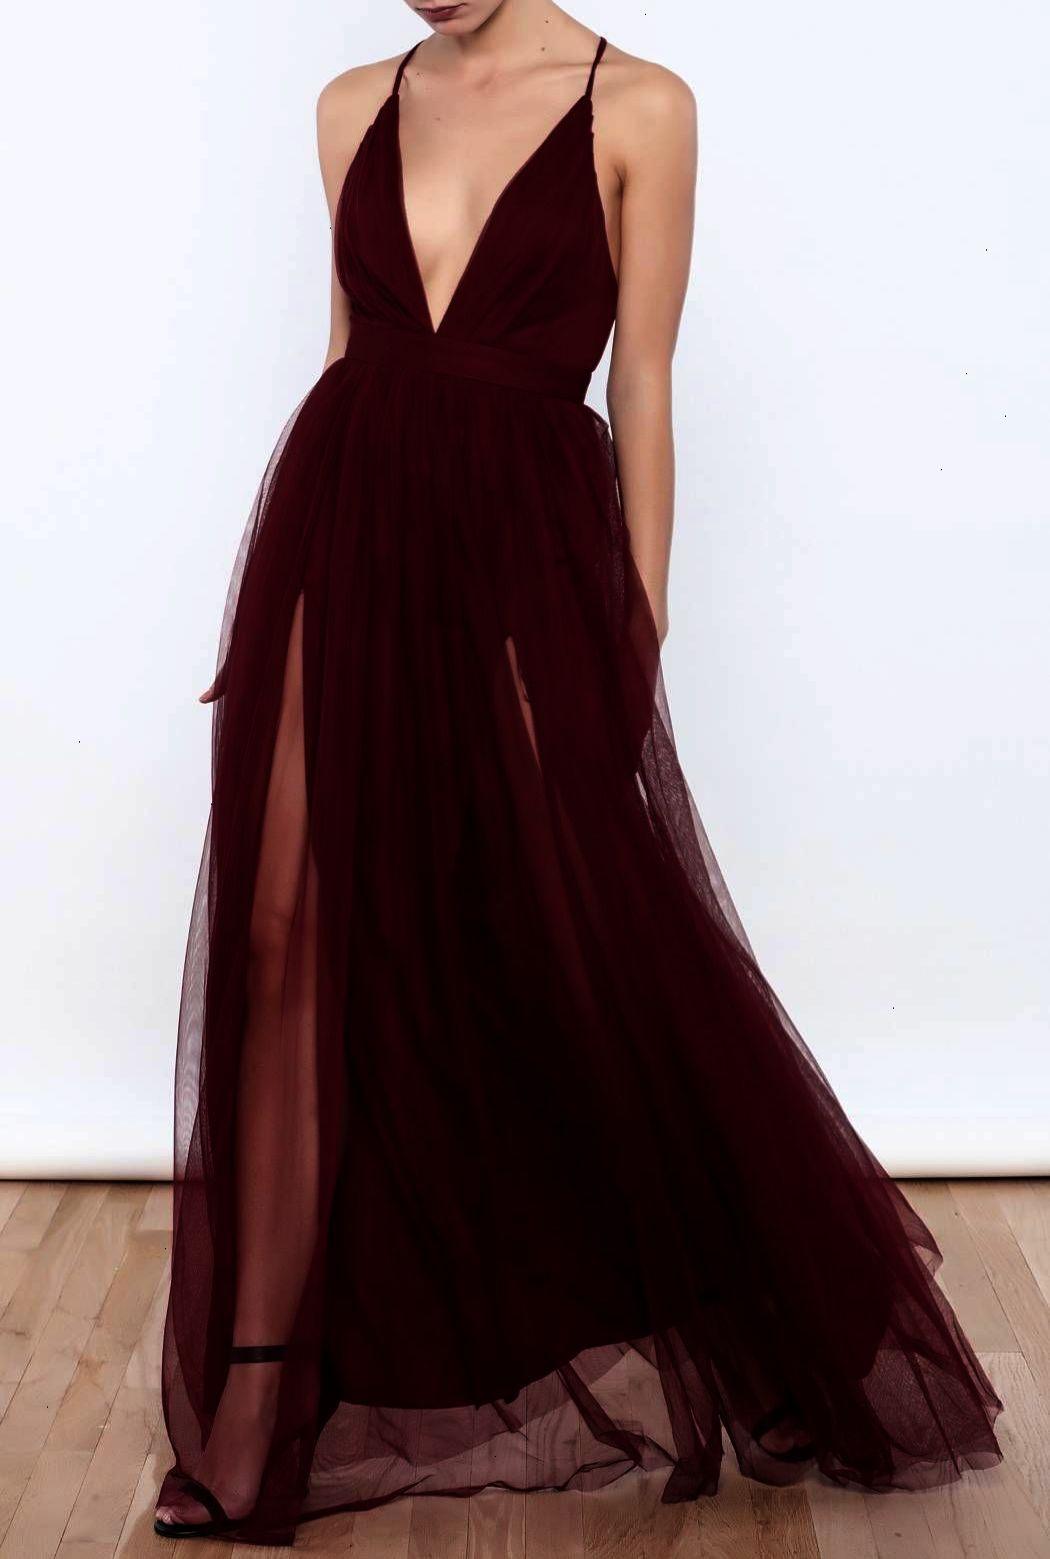 Prom dress prom dresses sexy black prom dresses plunging v neck